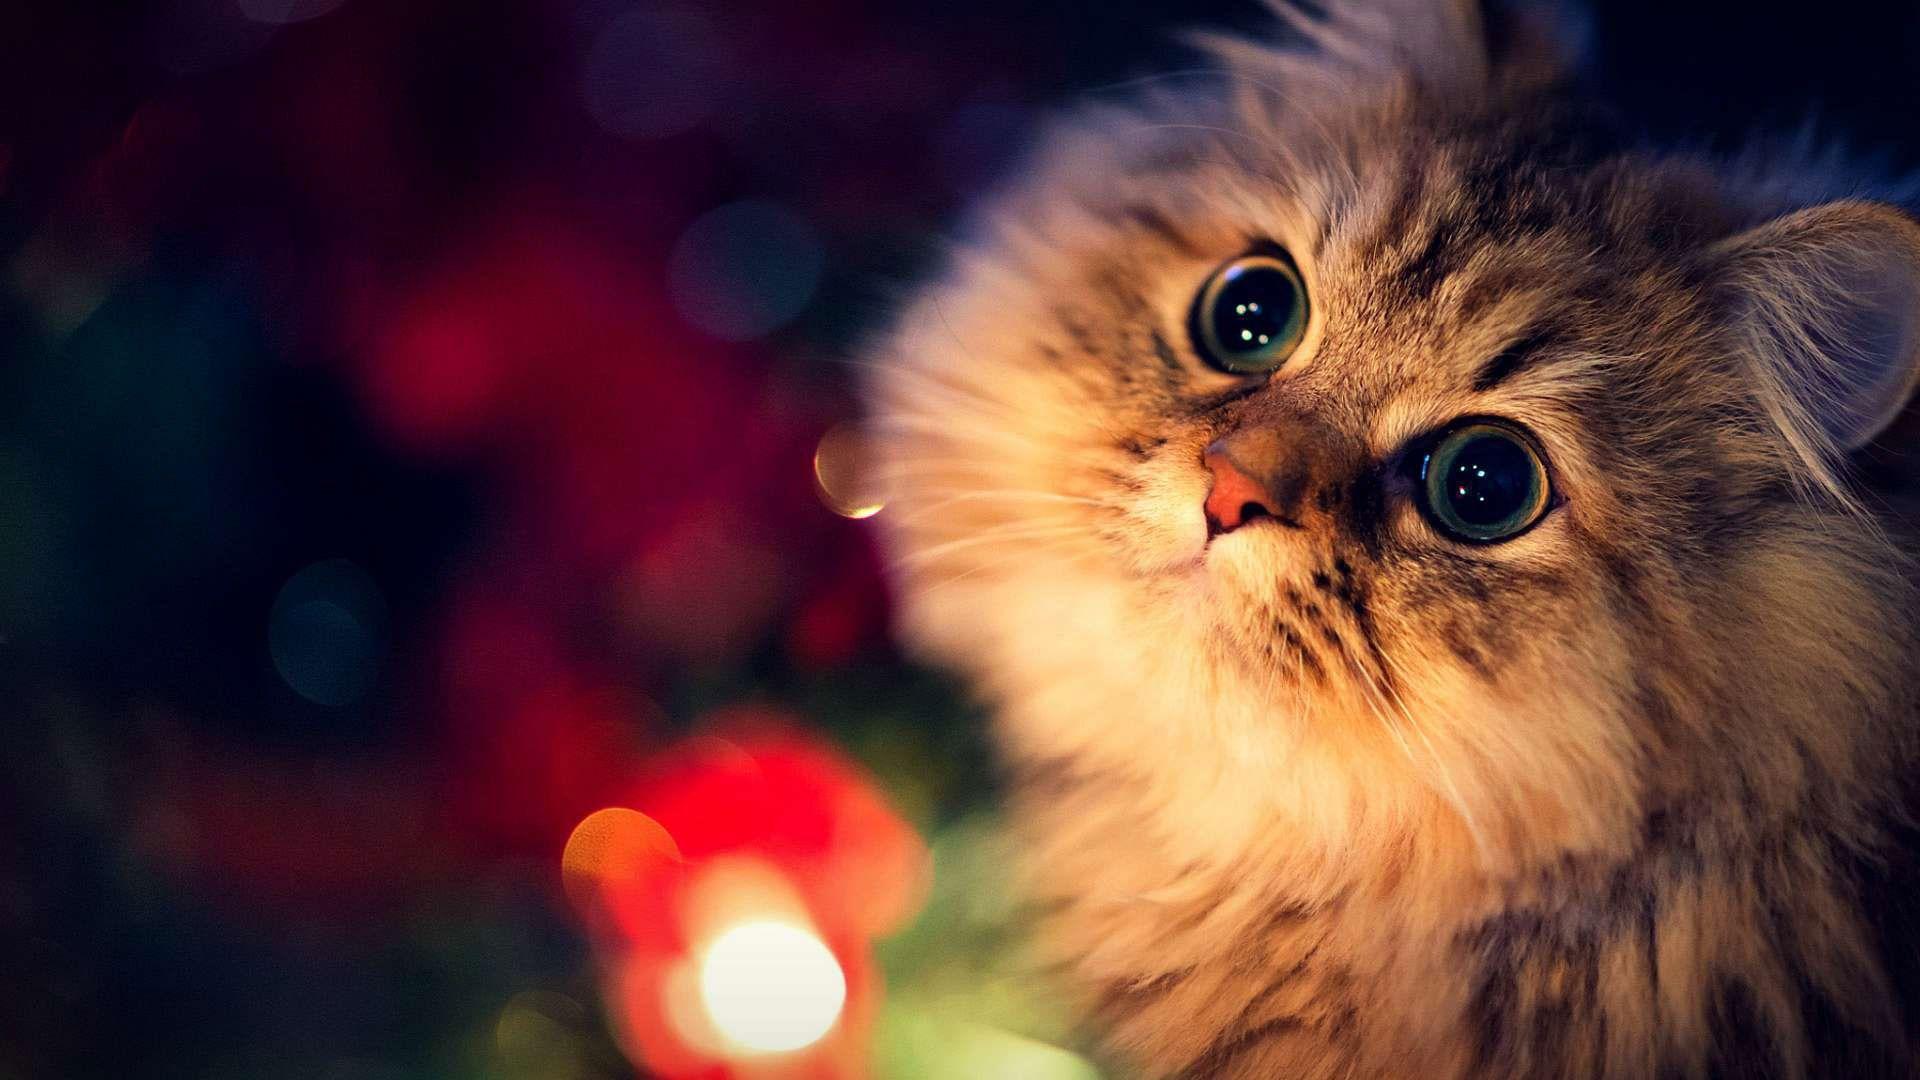 Beautiful Hd Quality Desktop Background Wallpaper 1080p Hd Image Cat Wallpaper Animal Wallpaper Christmas Cats